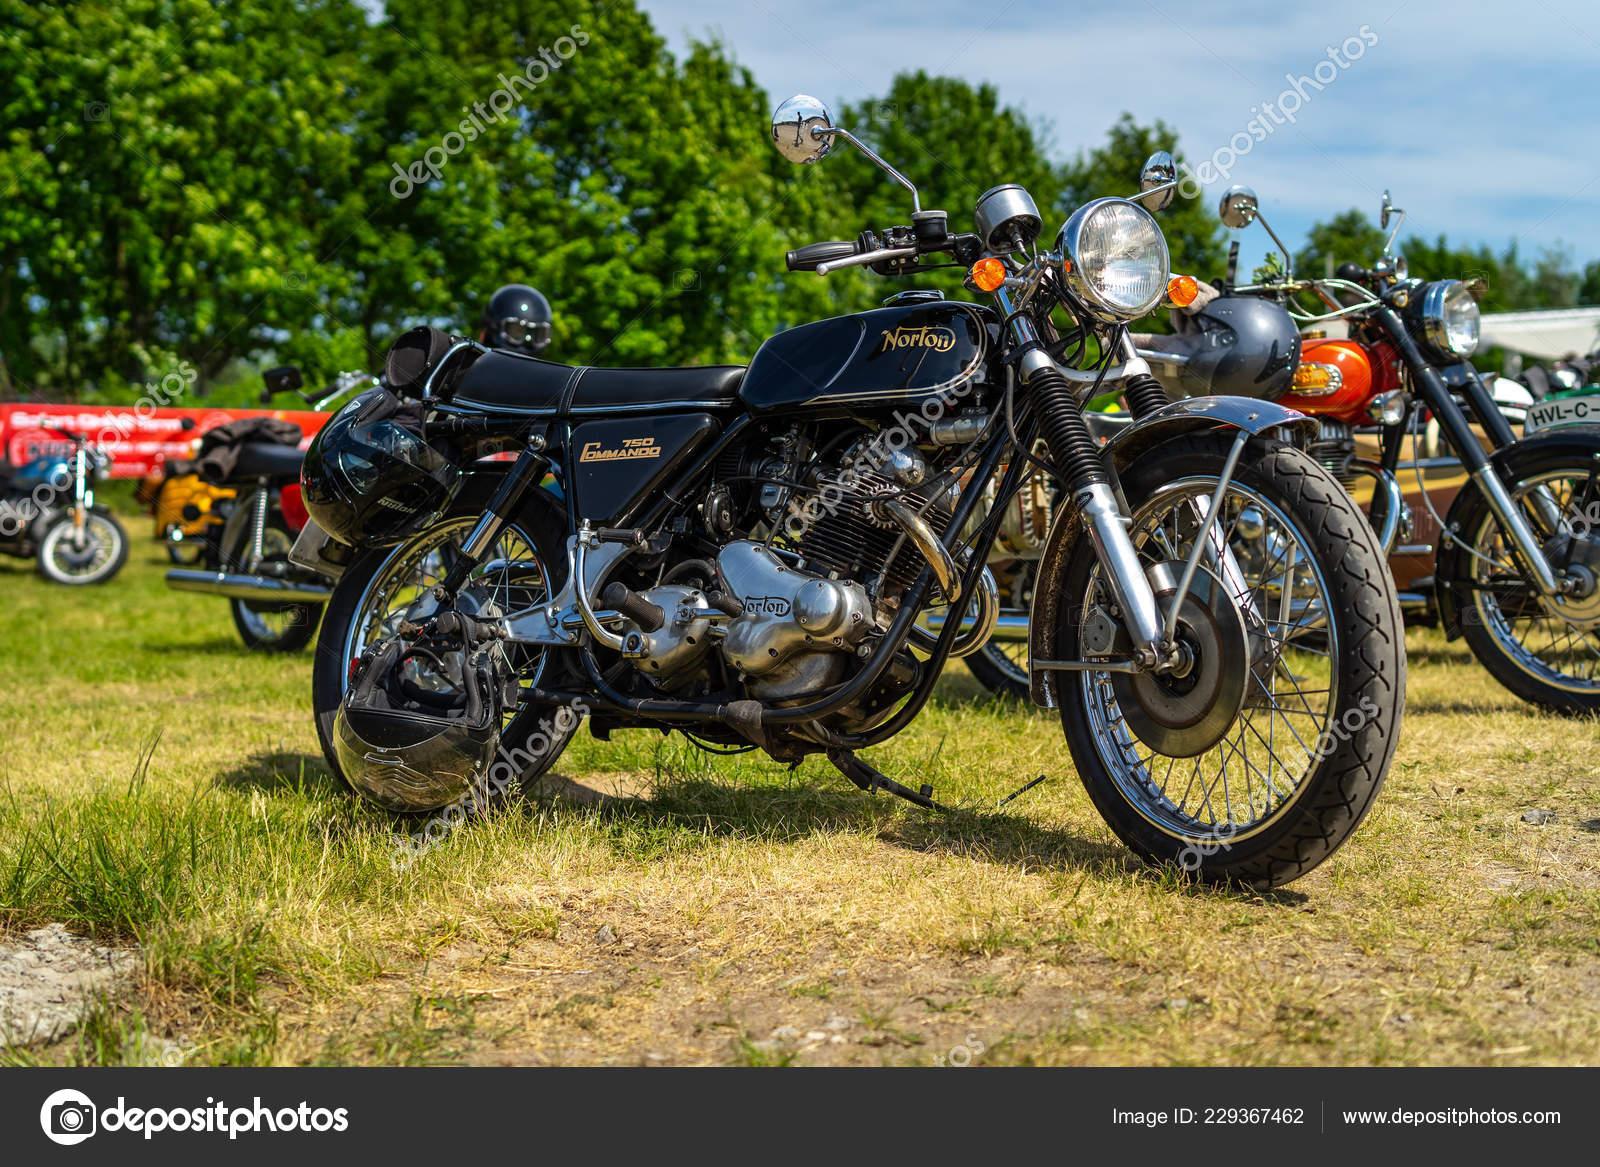 Paaren Glien Germany May 2018 Classic British Motorcycle Norton Commando Stock Editorial Photo C S Kohl 229367462